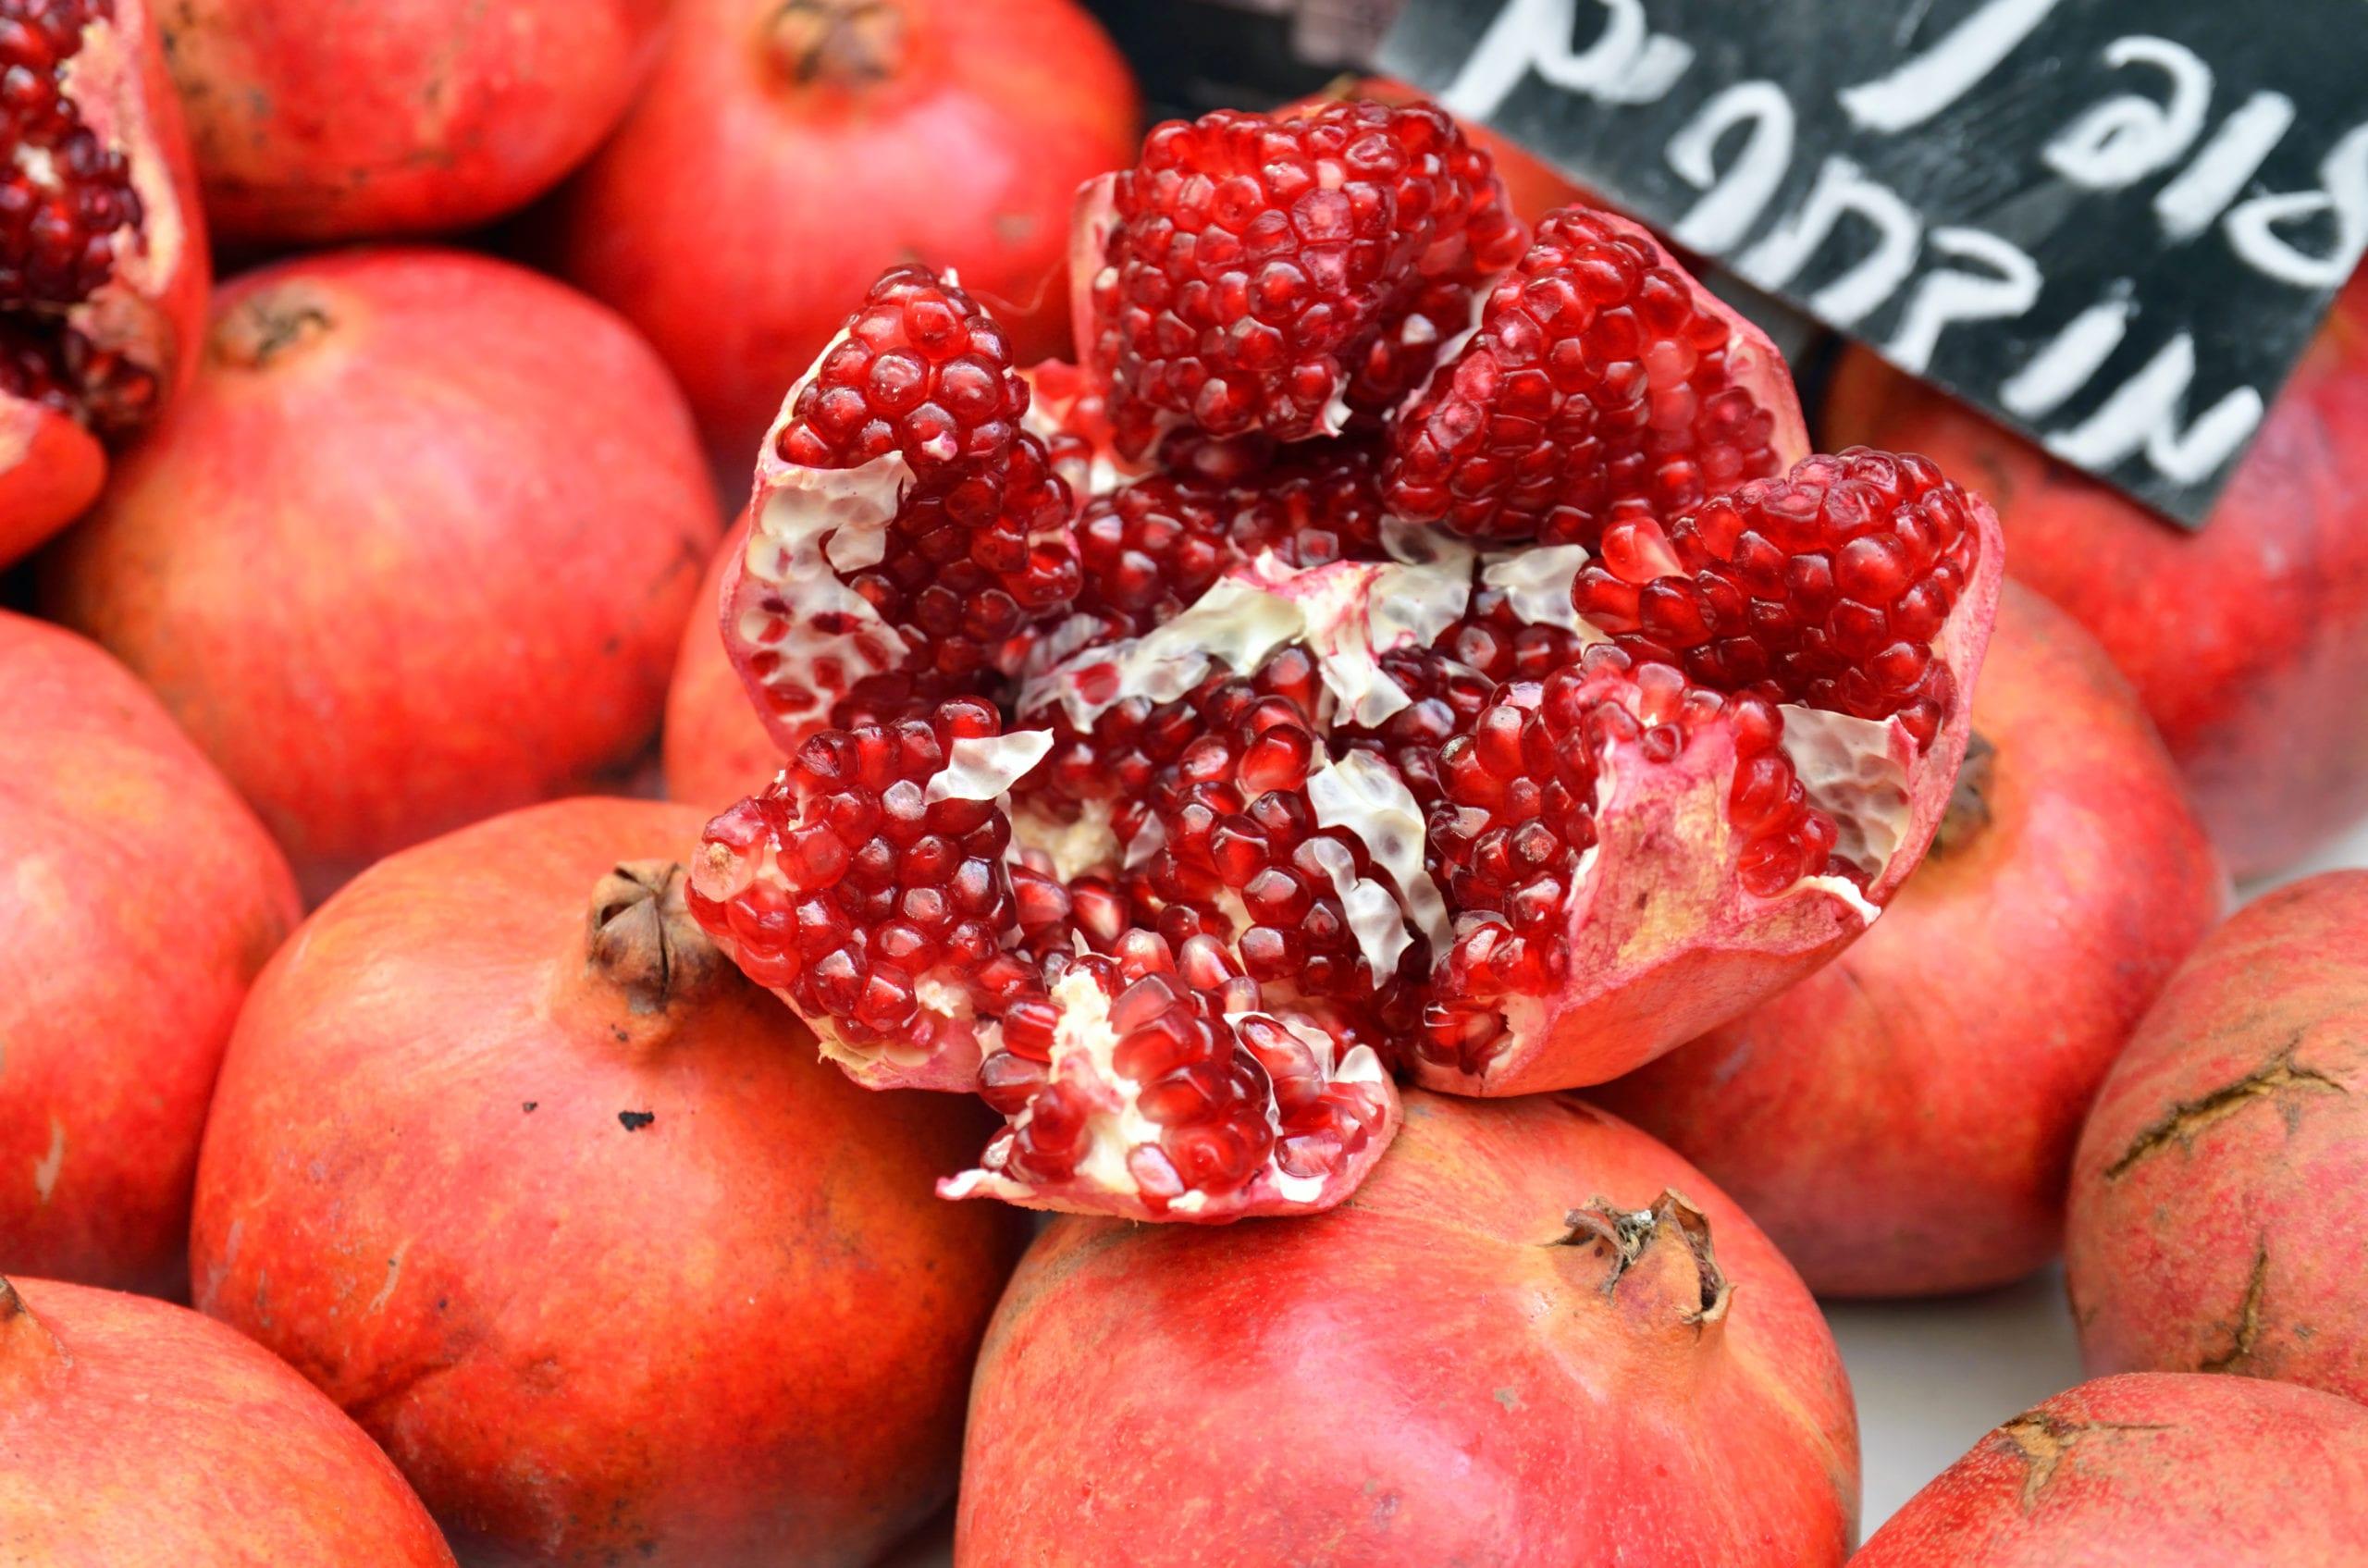 pomegranate-open-in-market